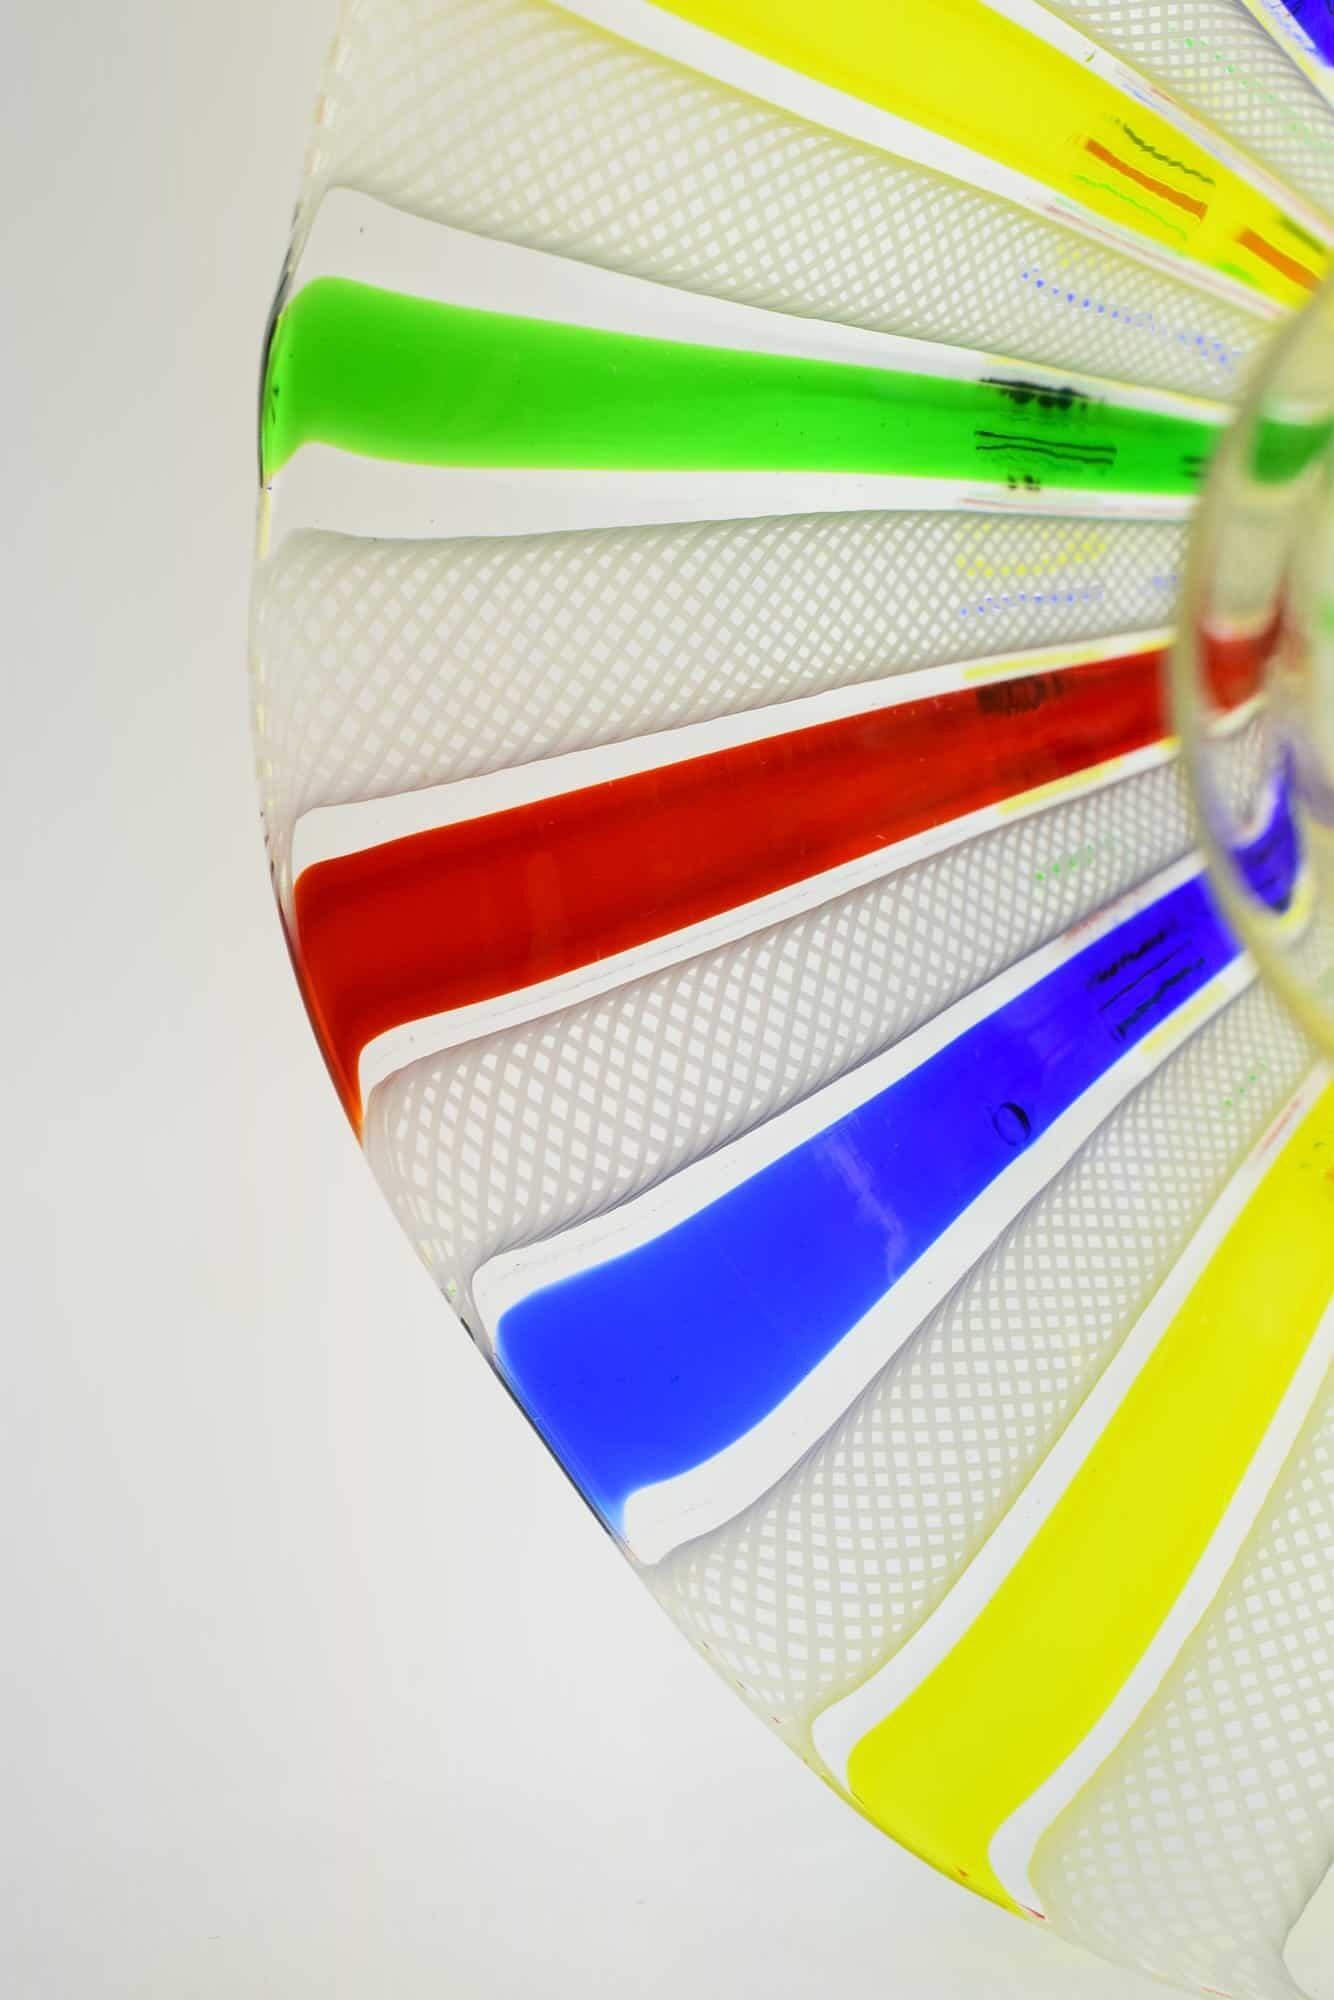 Murano Glass Reticel Candelabra (Art. 36877)